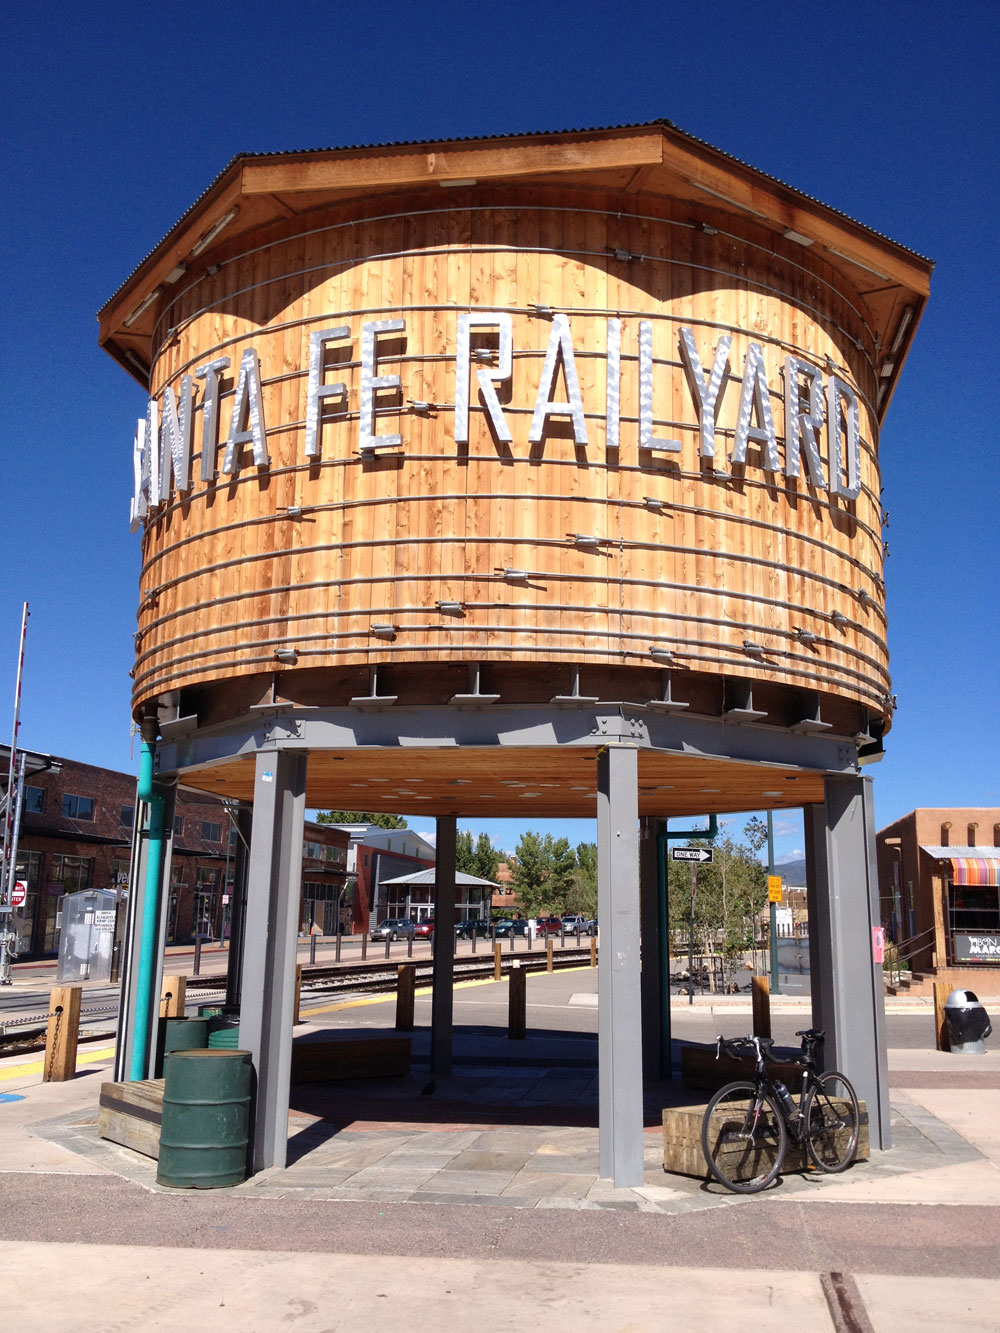 SANTA FE TOURS - Take a Guided Tour while in Santa Fe at